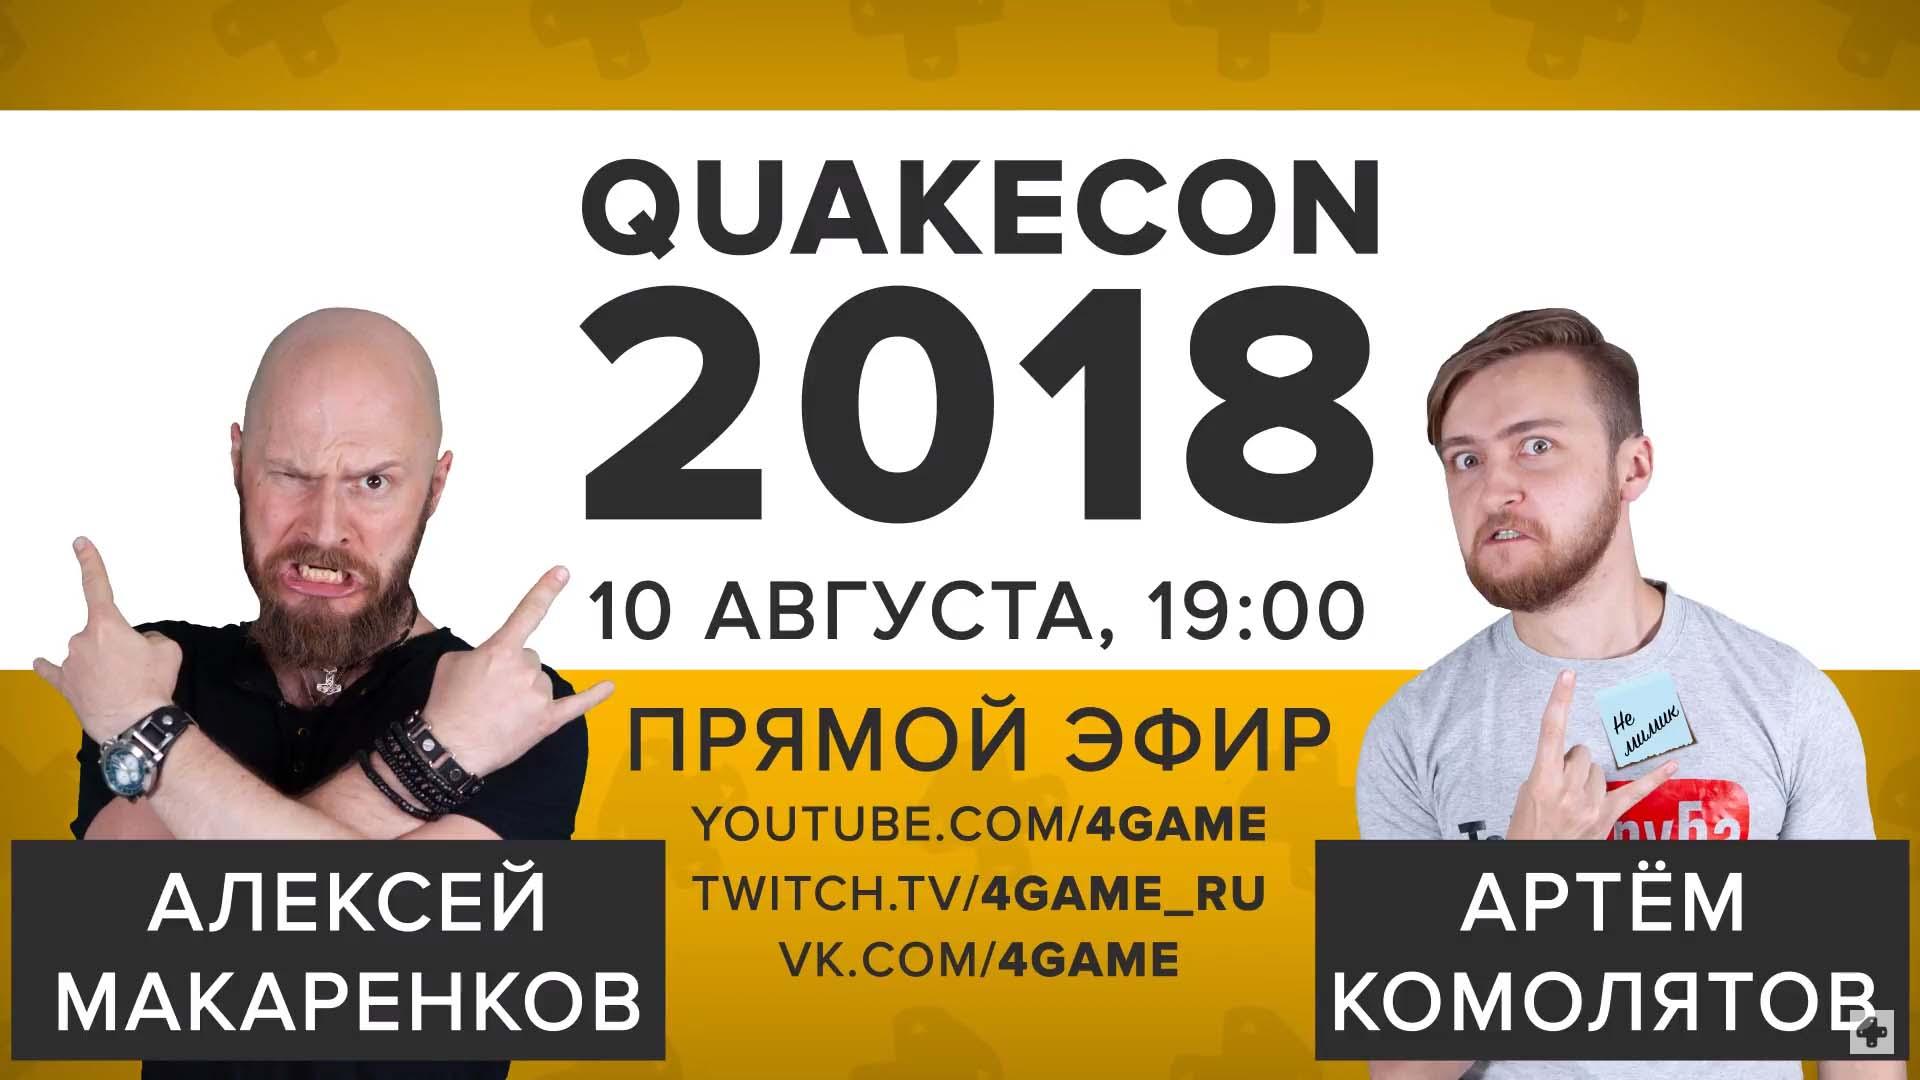 Quakecon Фогеймер Александр Меркушев. Алексей Макареенков